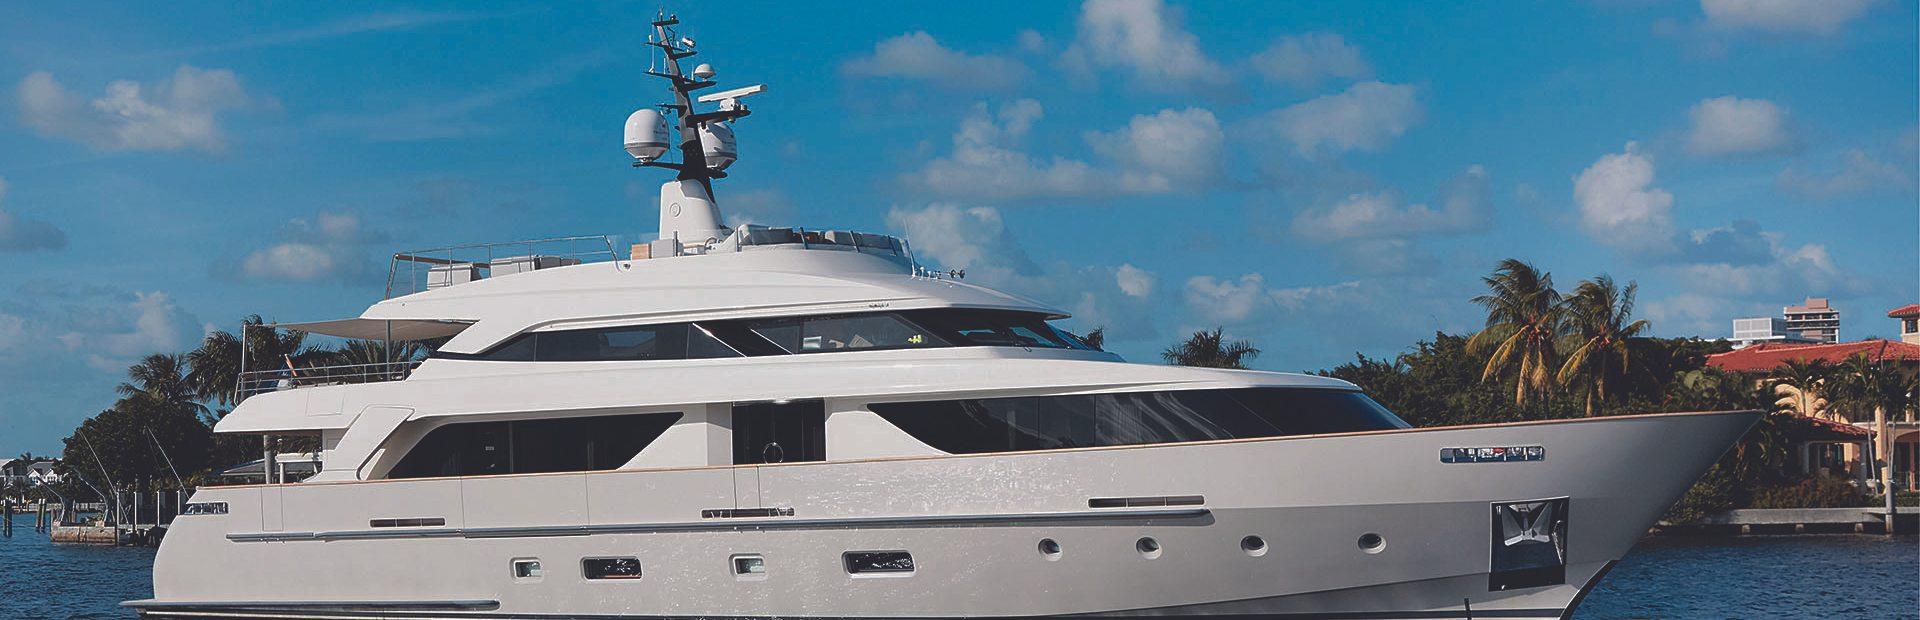 SD112 Yacht Charter